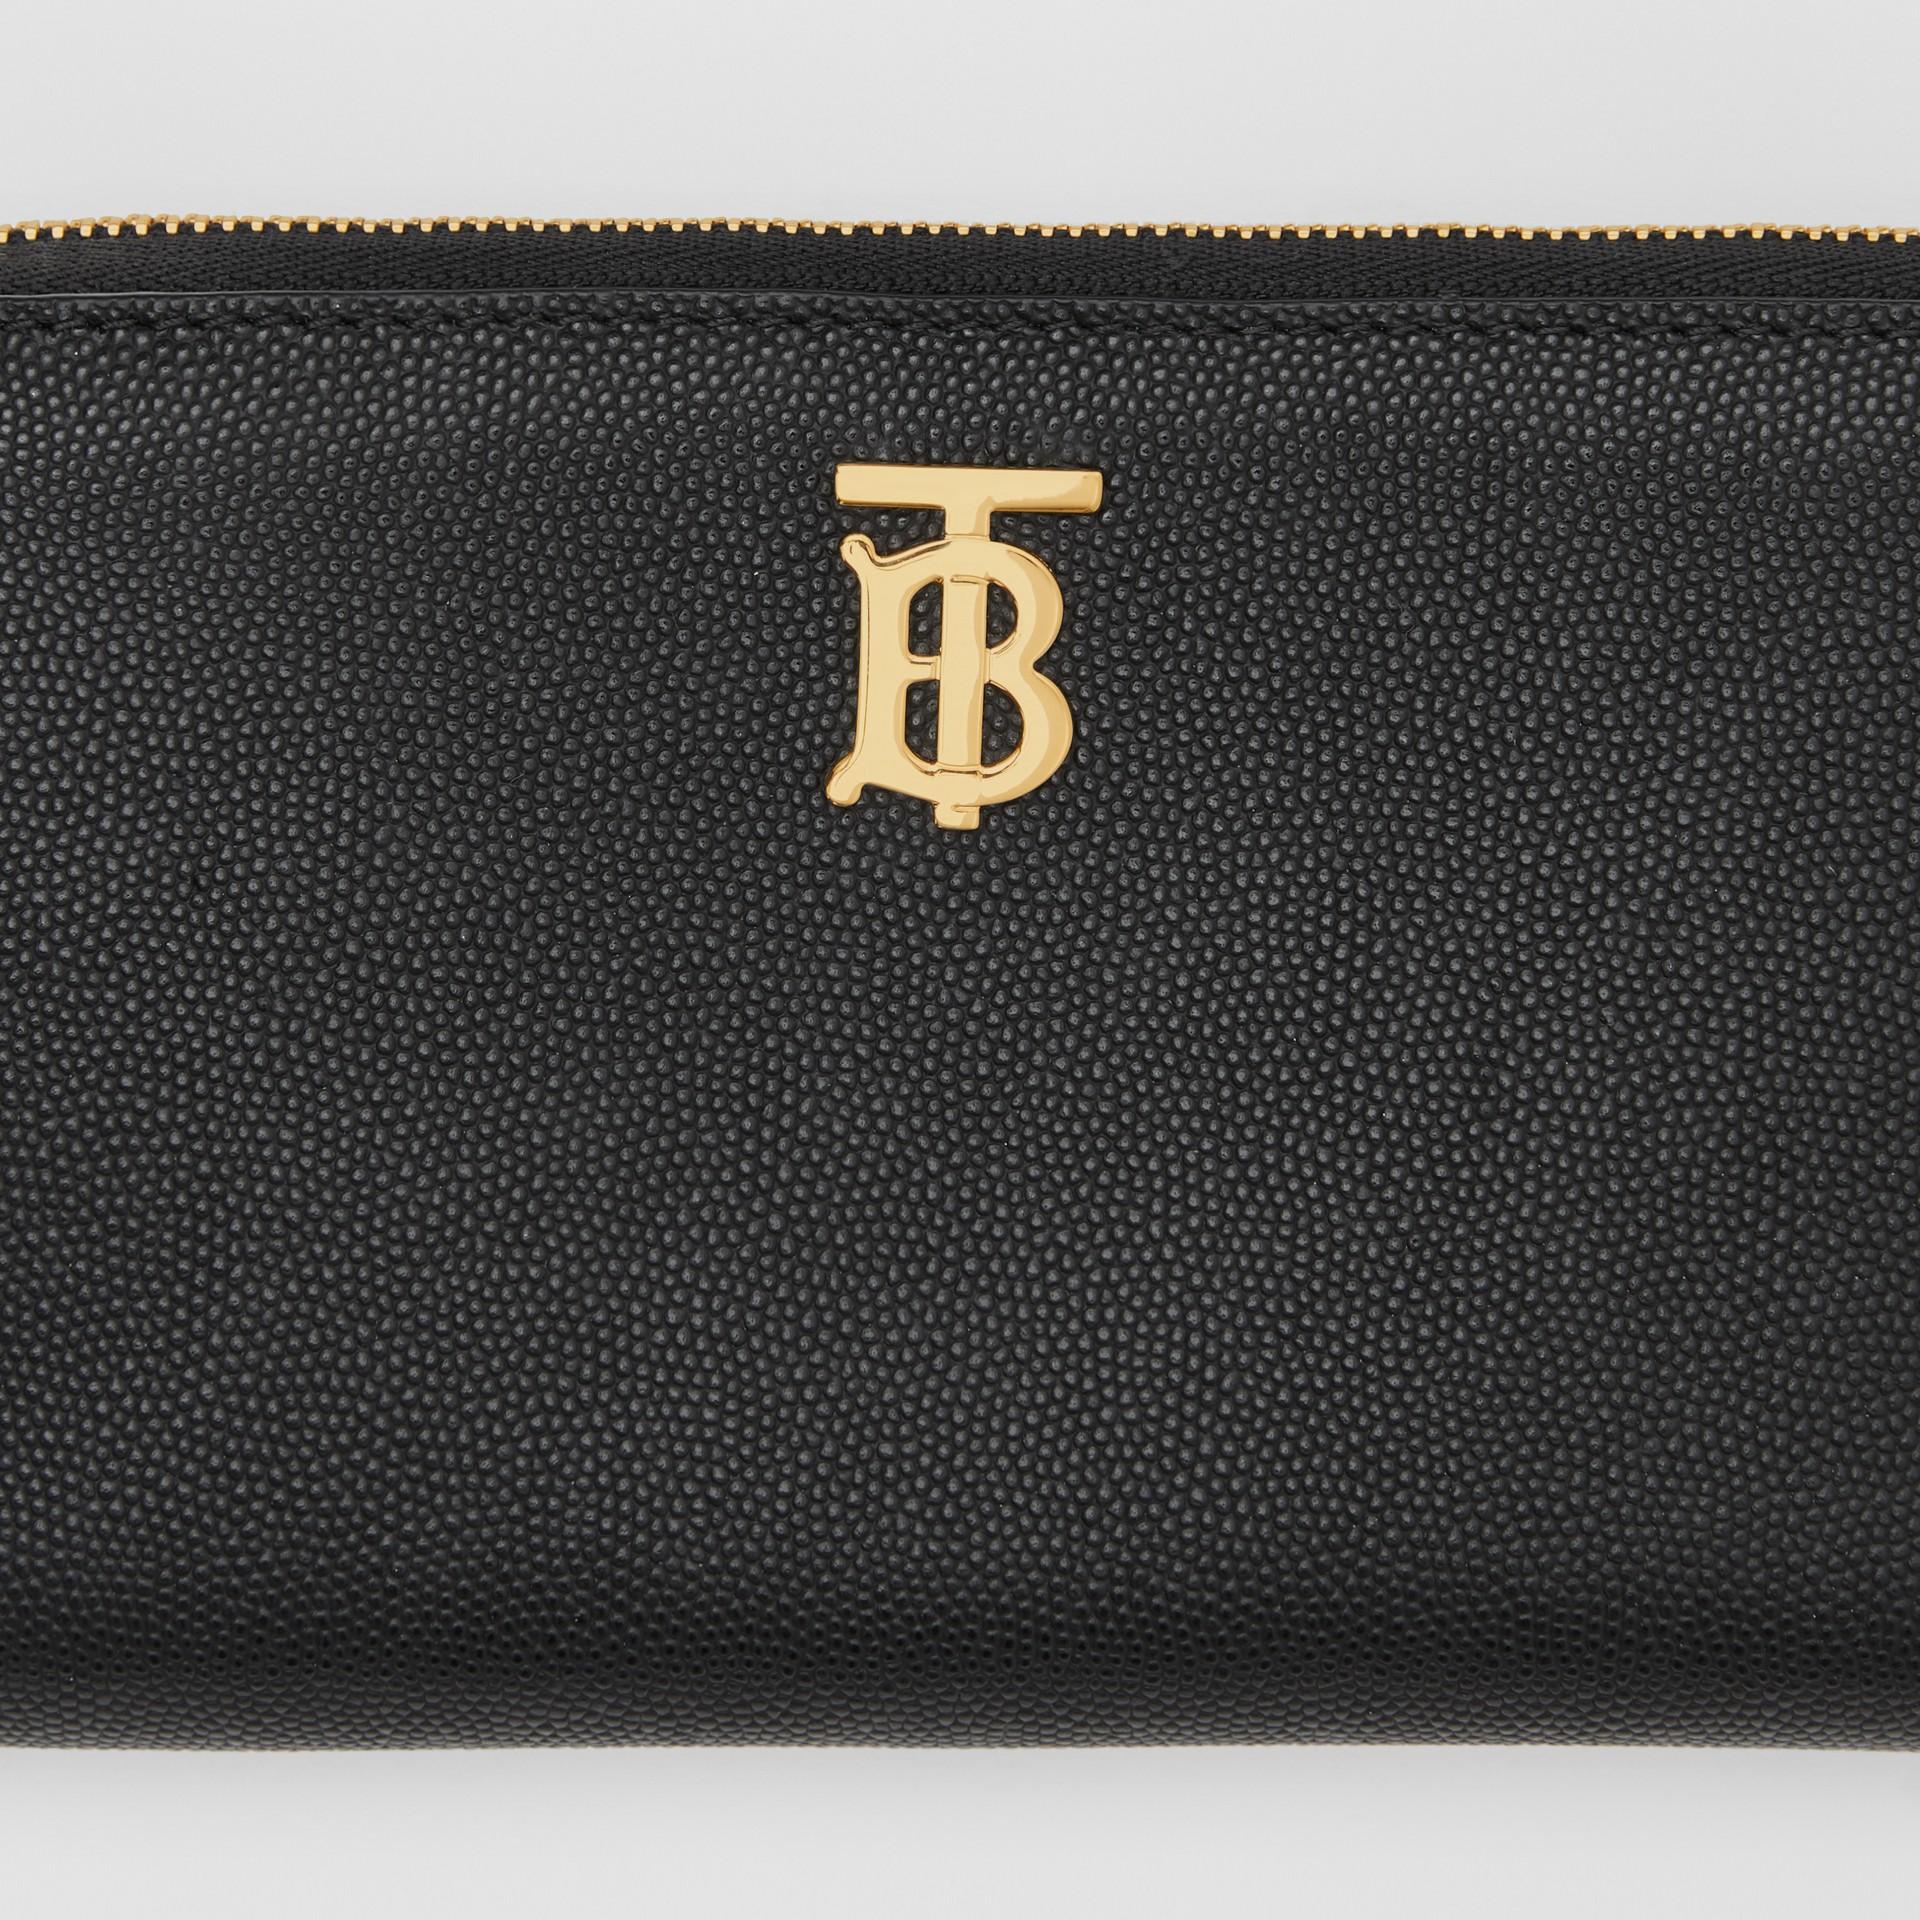 Monogram Motif Grainy Leather Ziparound Wallet in Black - Women | Burberry Australia - gallery image 1